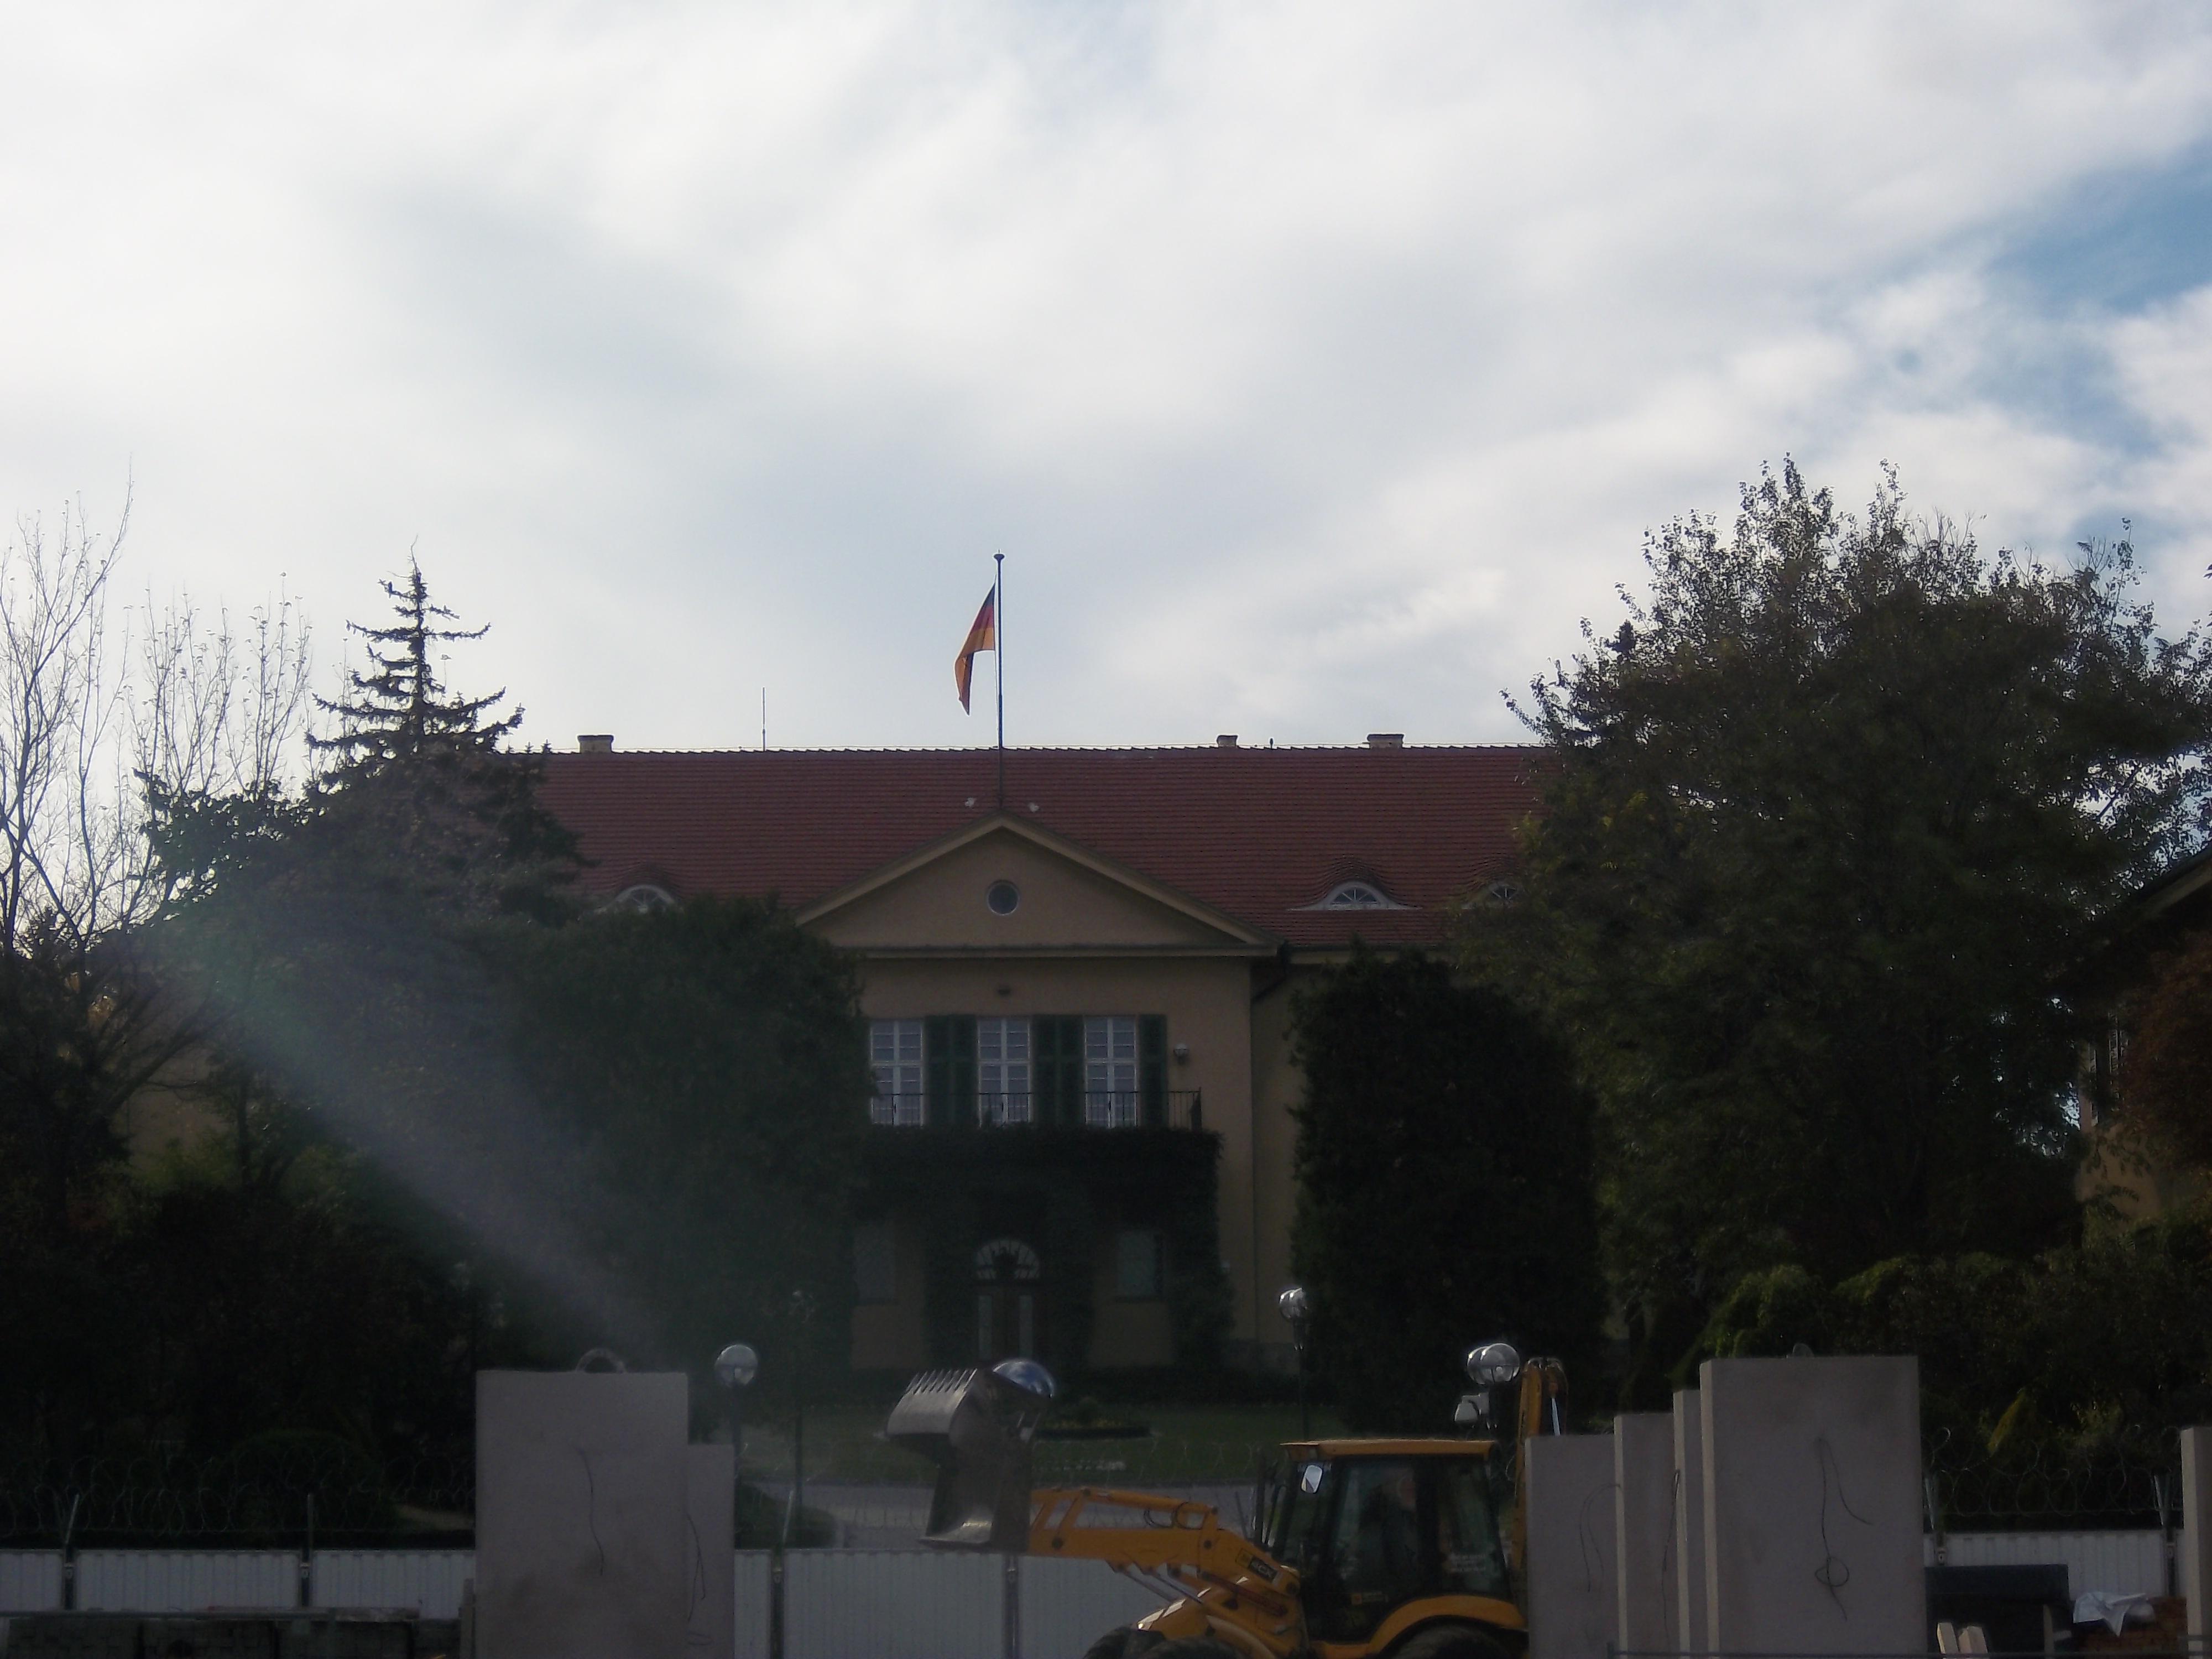 turchia_terrorismo_germania_chiude_ambasciata